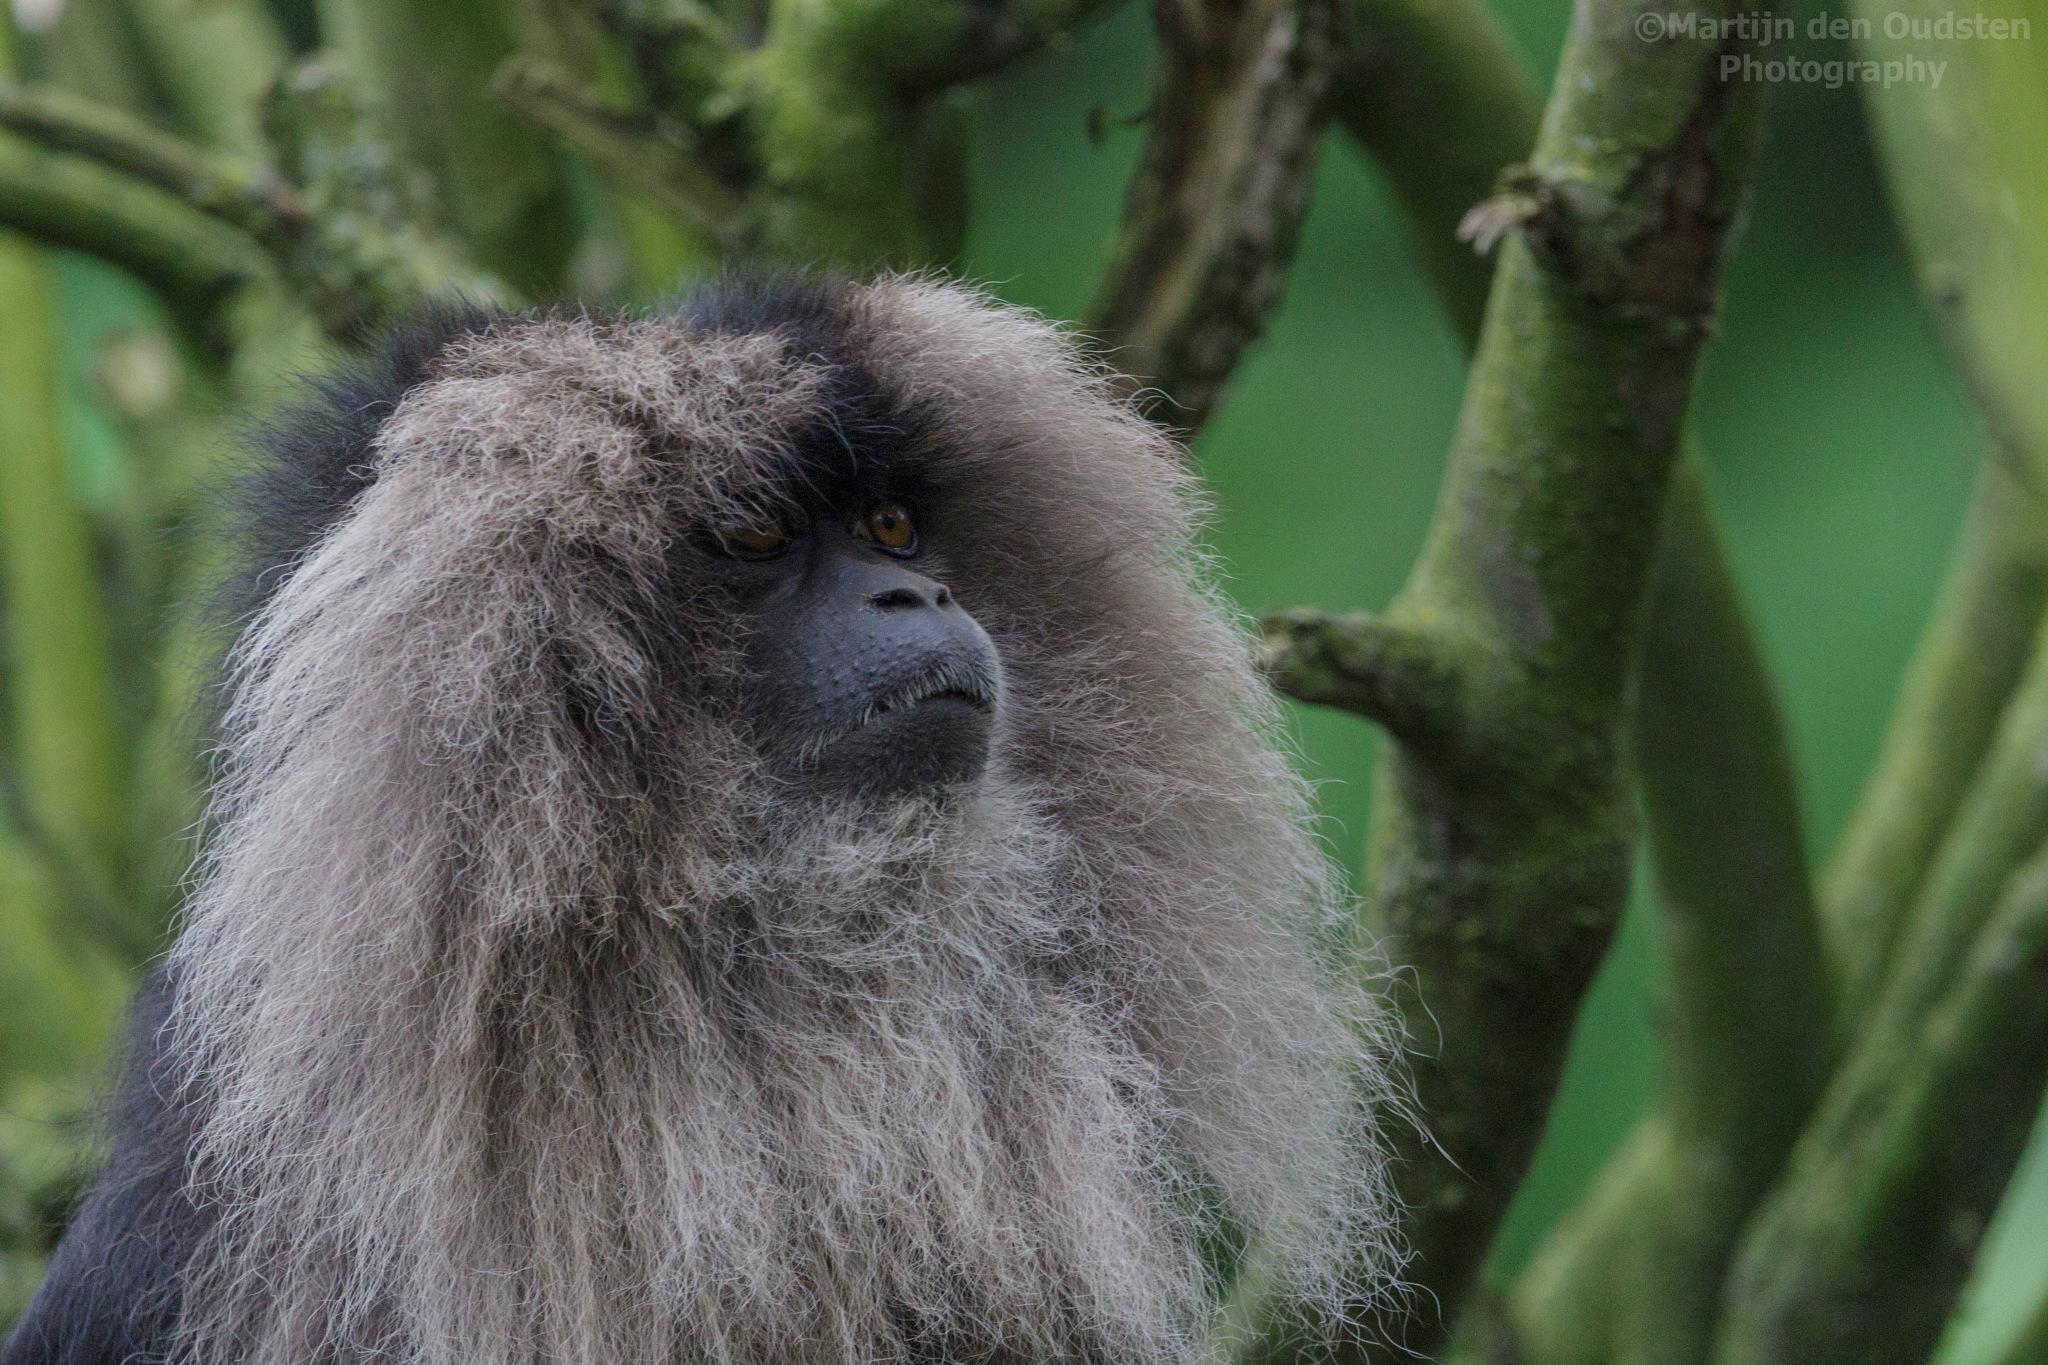 Lion-tailed macaque by Martijn Den Oudsten